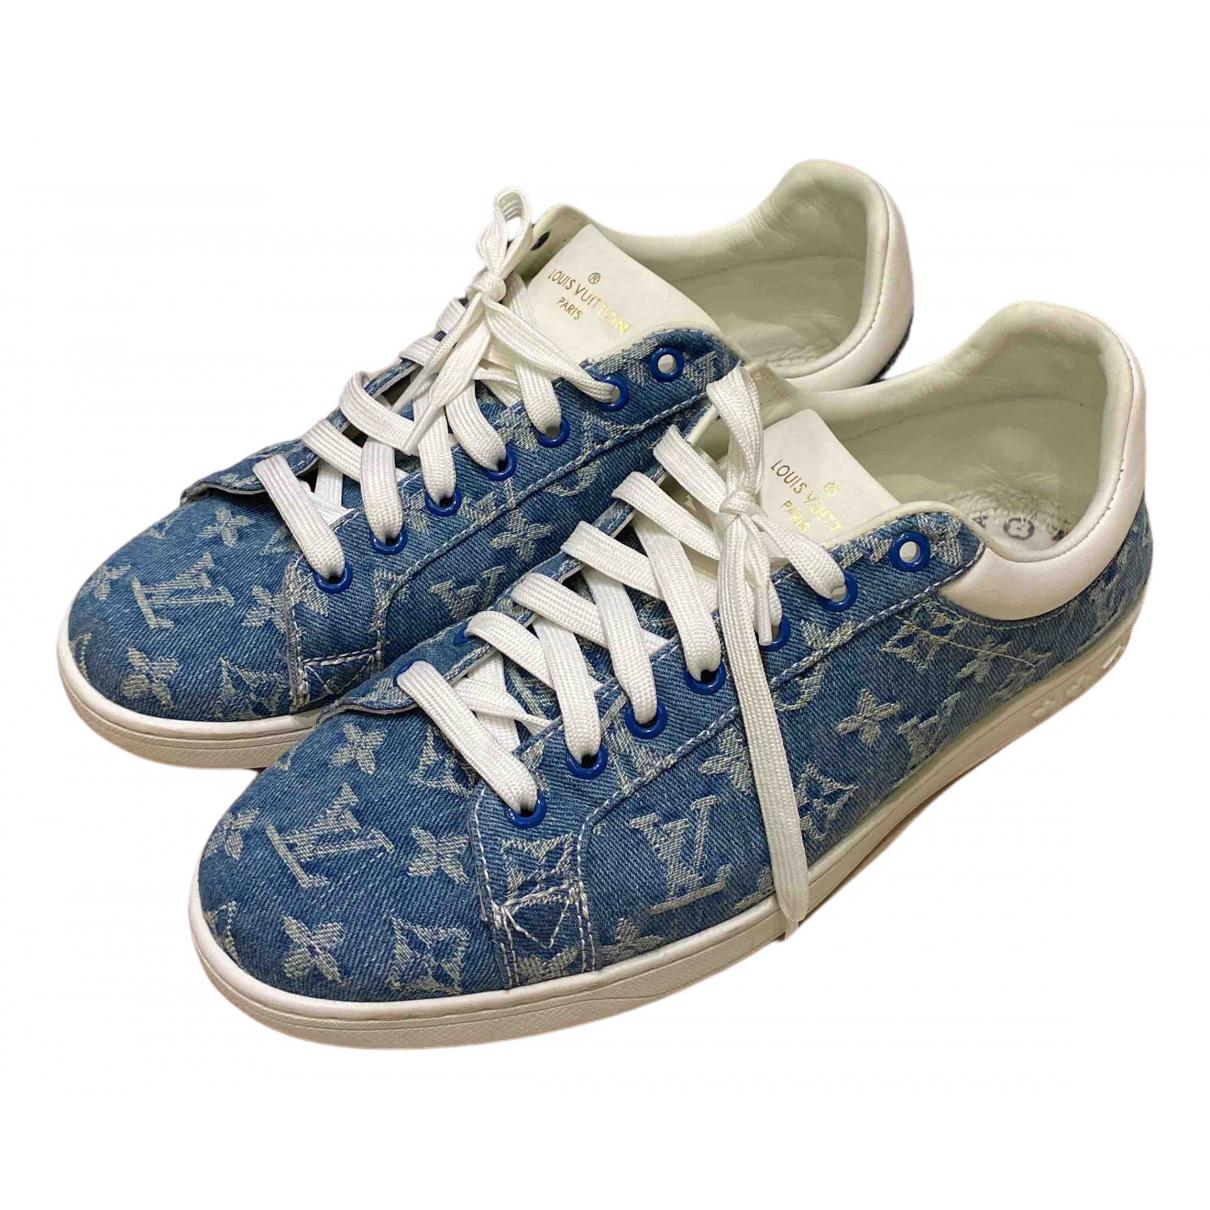 Louis Vuitton \N Sneakers in  Blau Leinen